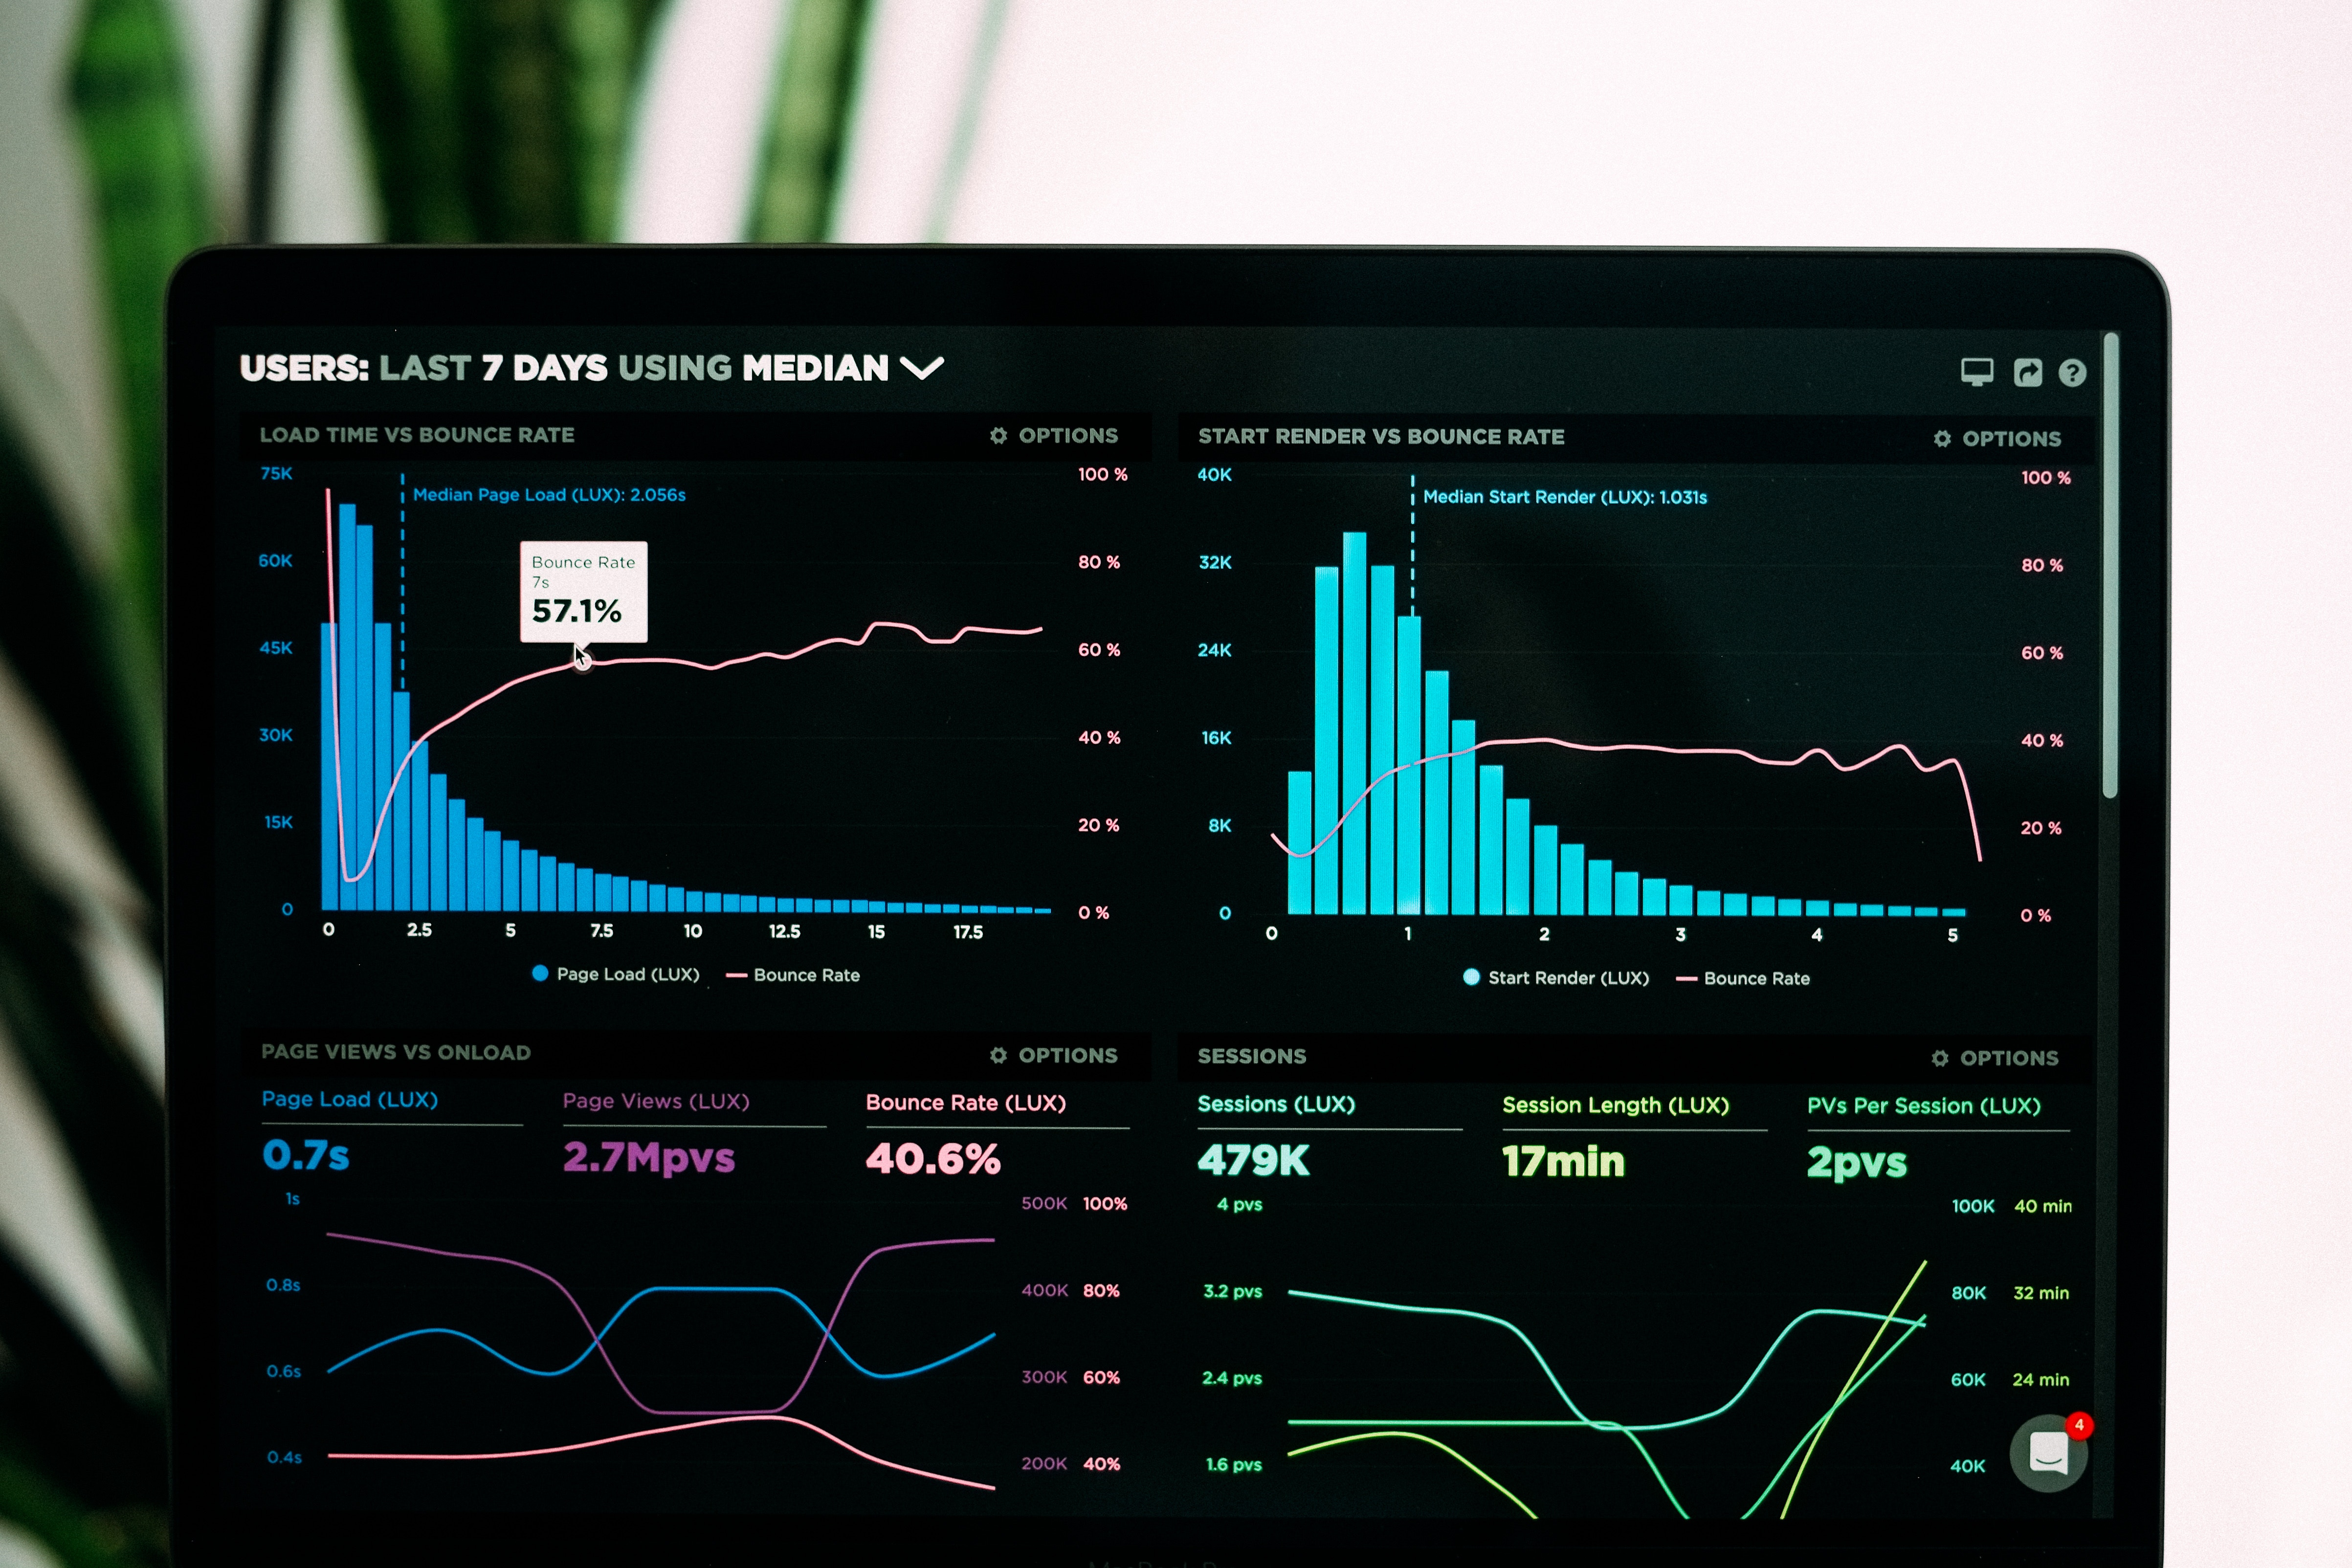 E-commerce store traffic optimization and analytics